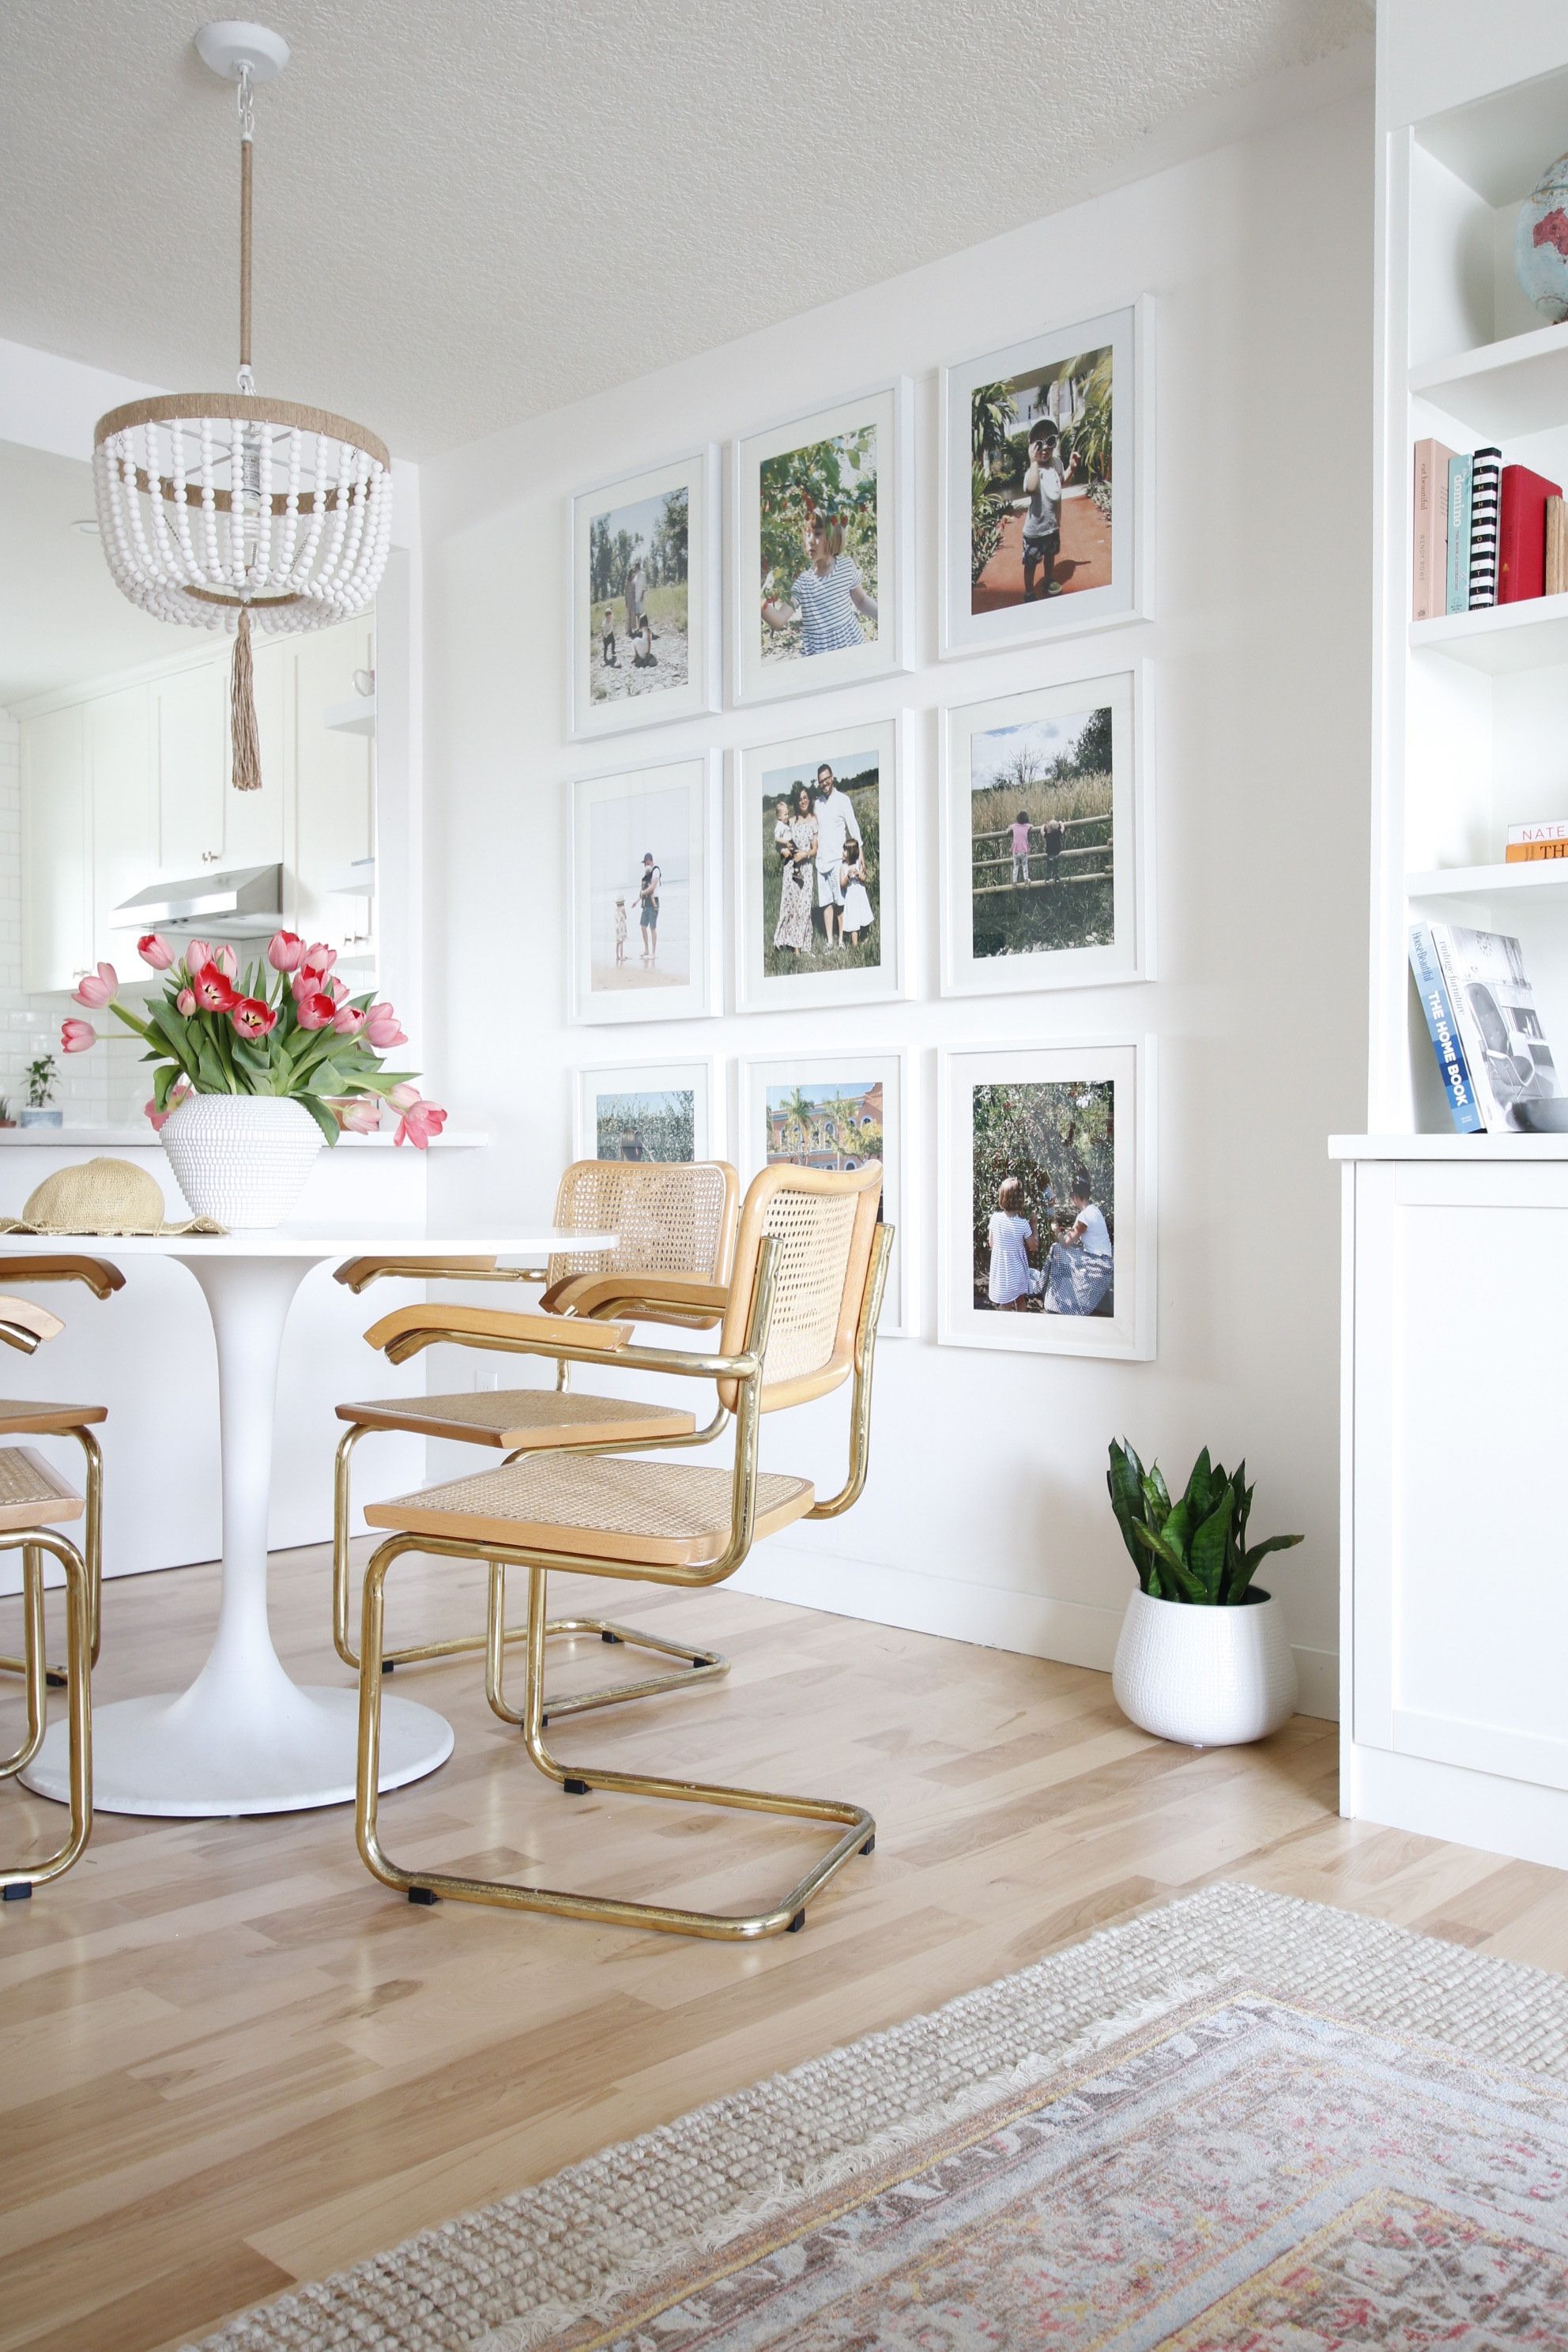 LT HOMES | Interior Design & Build Co.